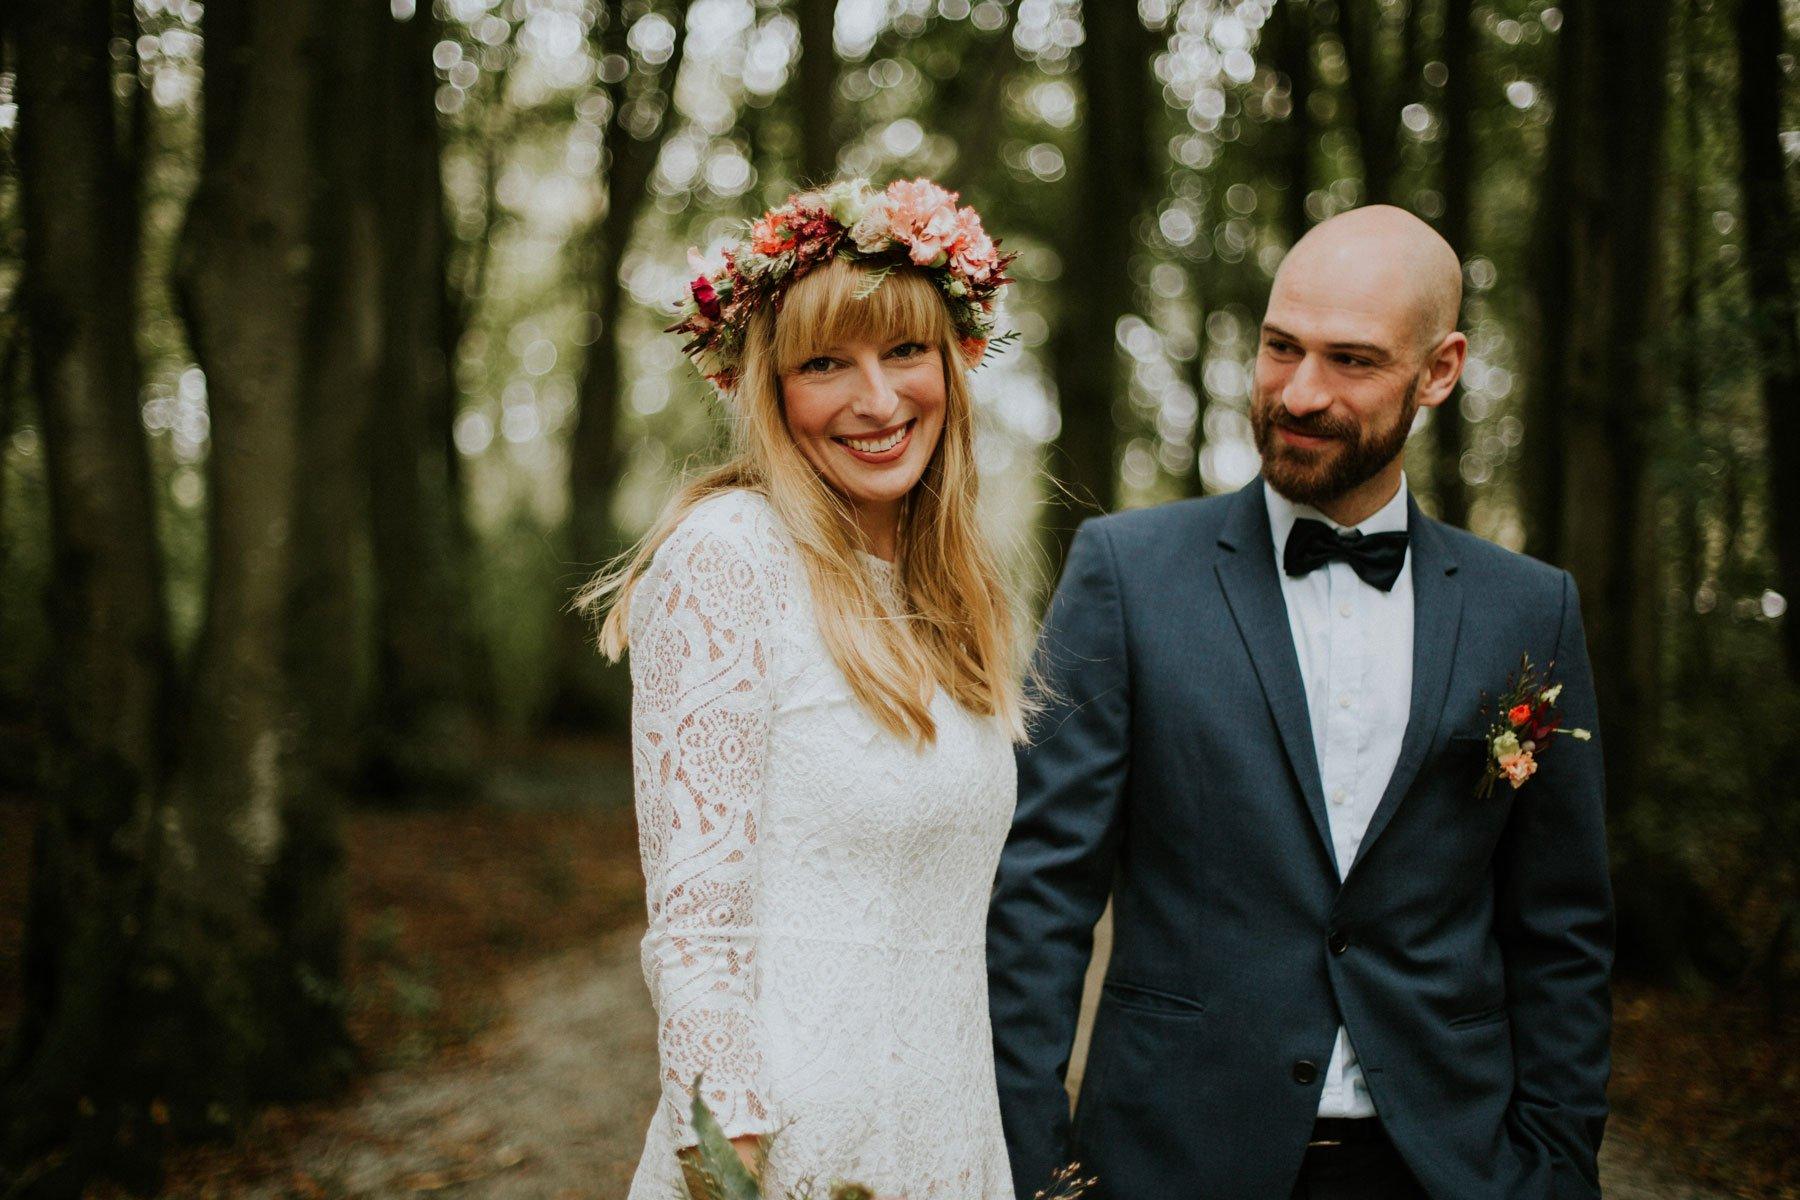 bride norwegian wedding lineowrenfotografi tuvamats